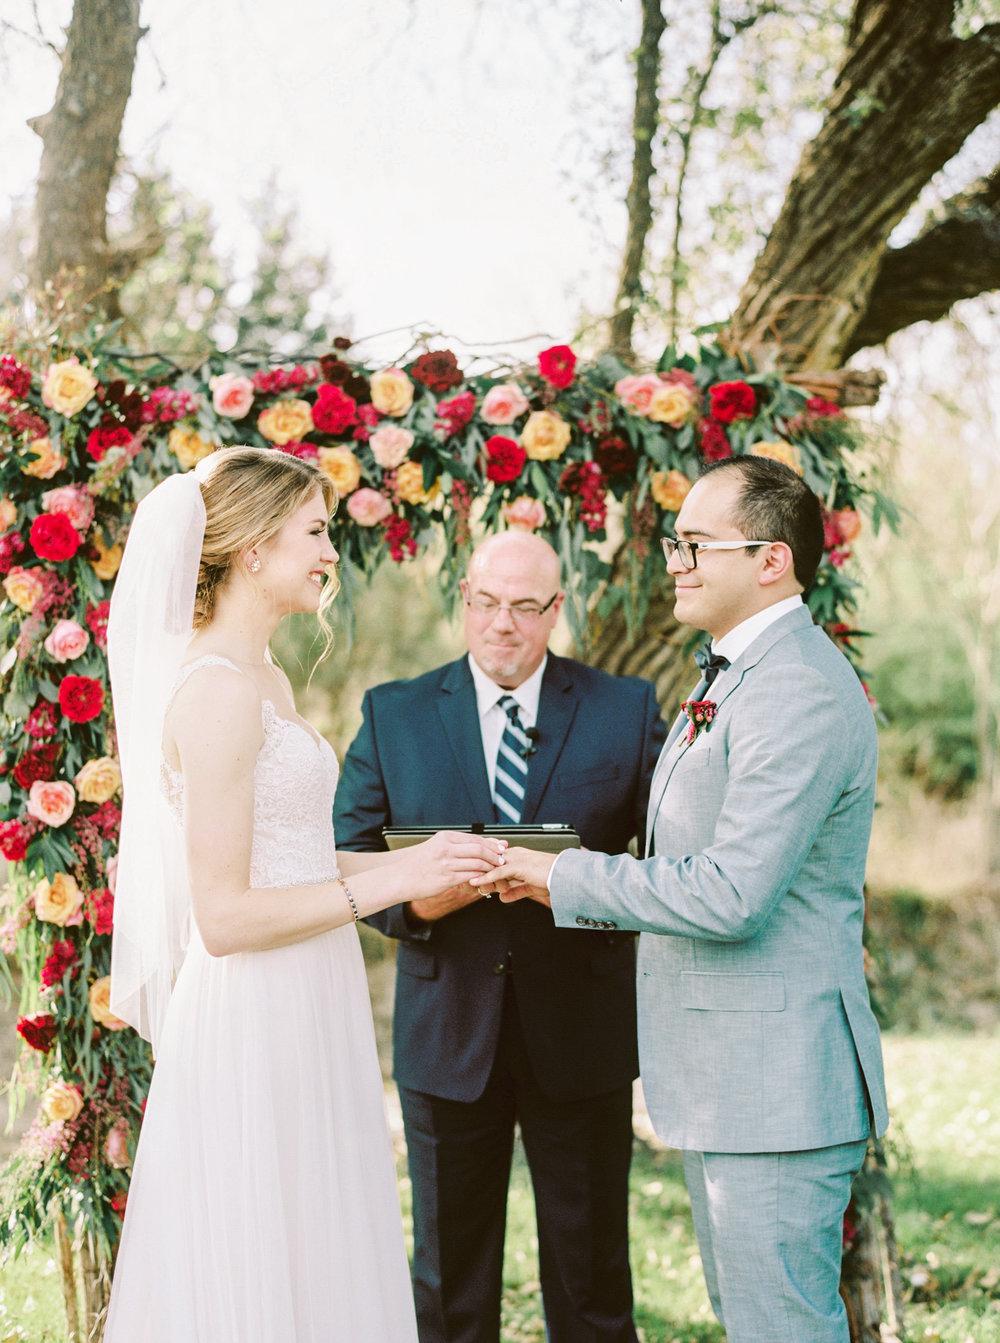 The-Creek-Haus-Wedding-Dripping-Springs-90.jpg